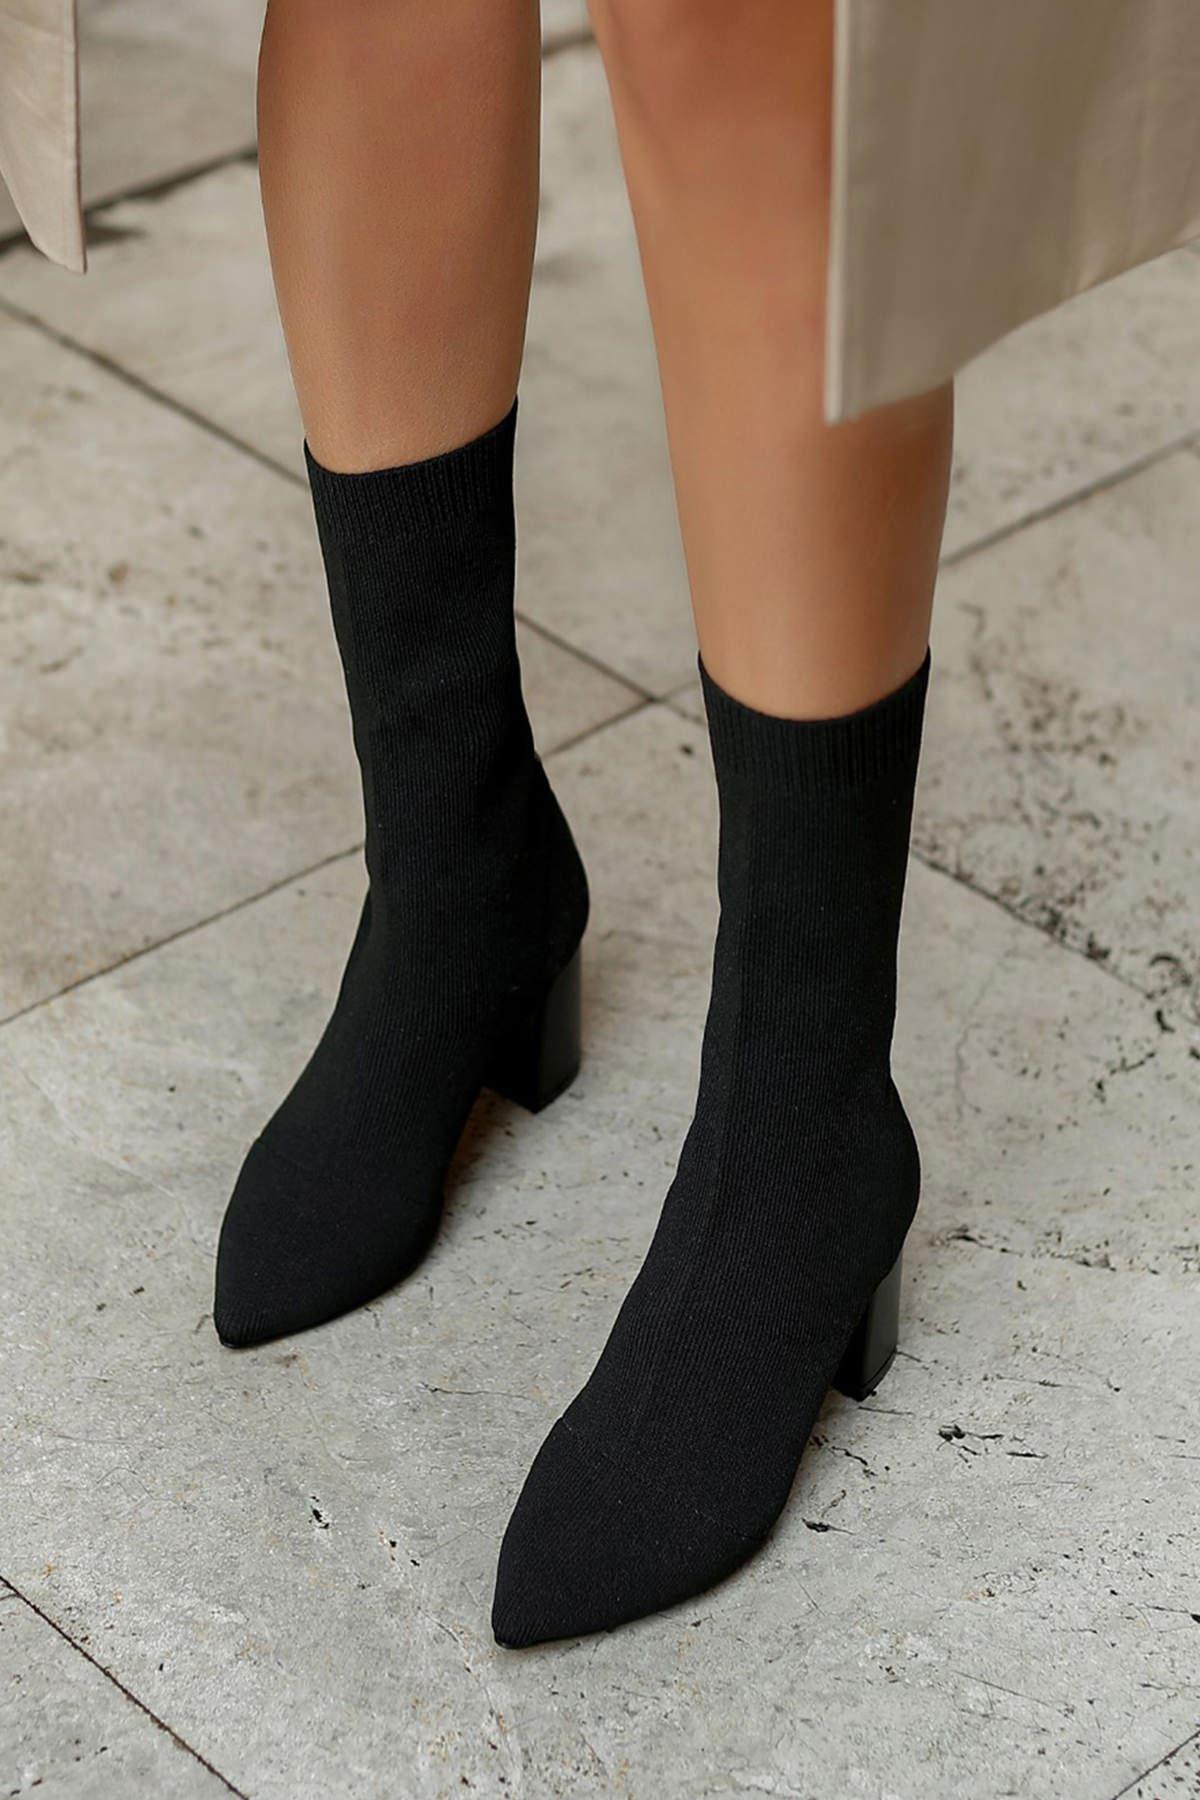 Carleone Kadın Triko Topuklu Bot-Siyah